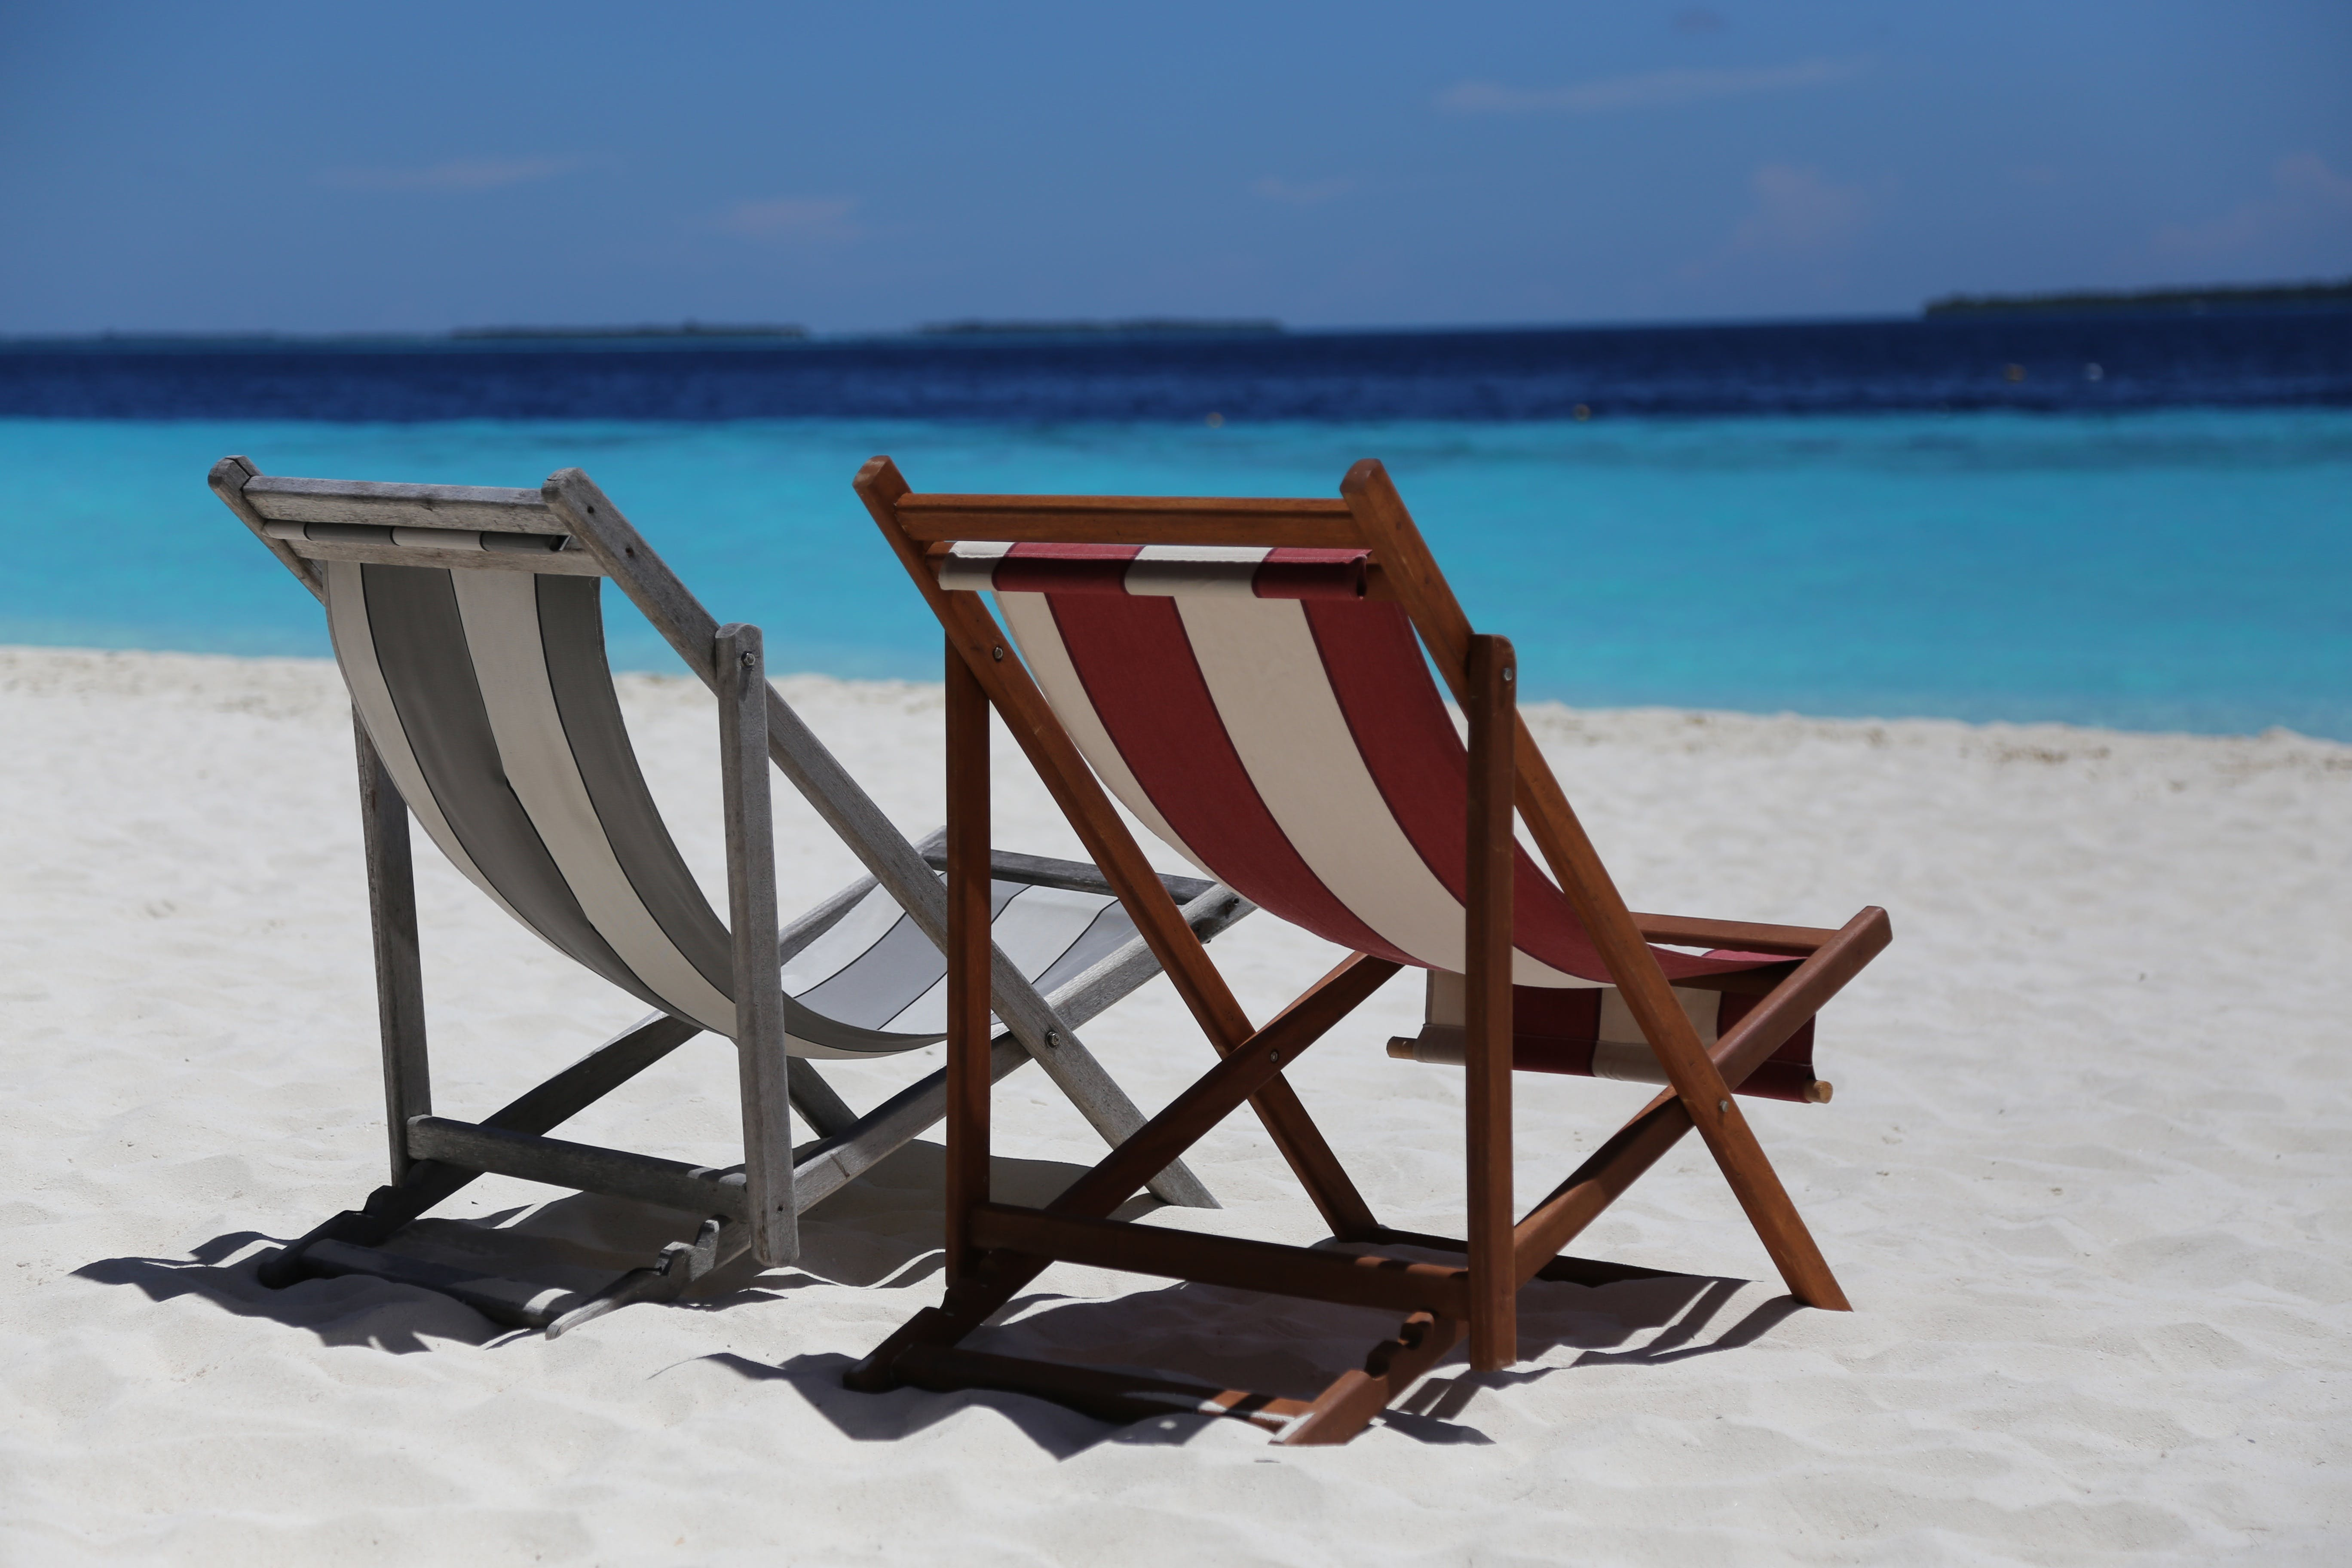 zu badeort, entspannung, erholung, ferien